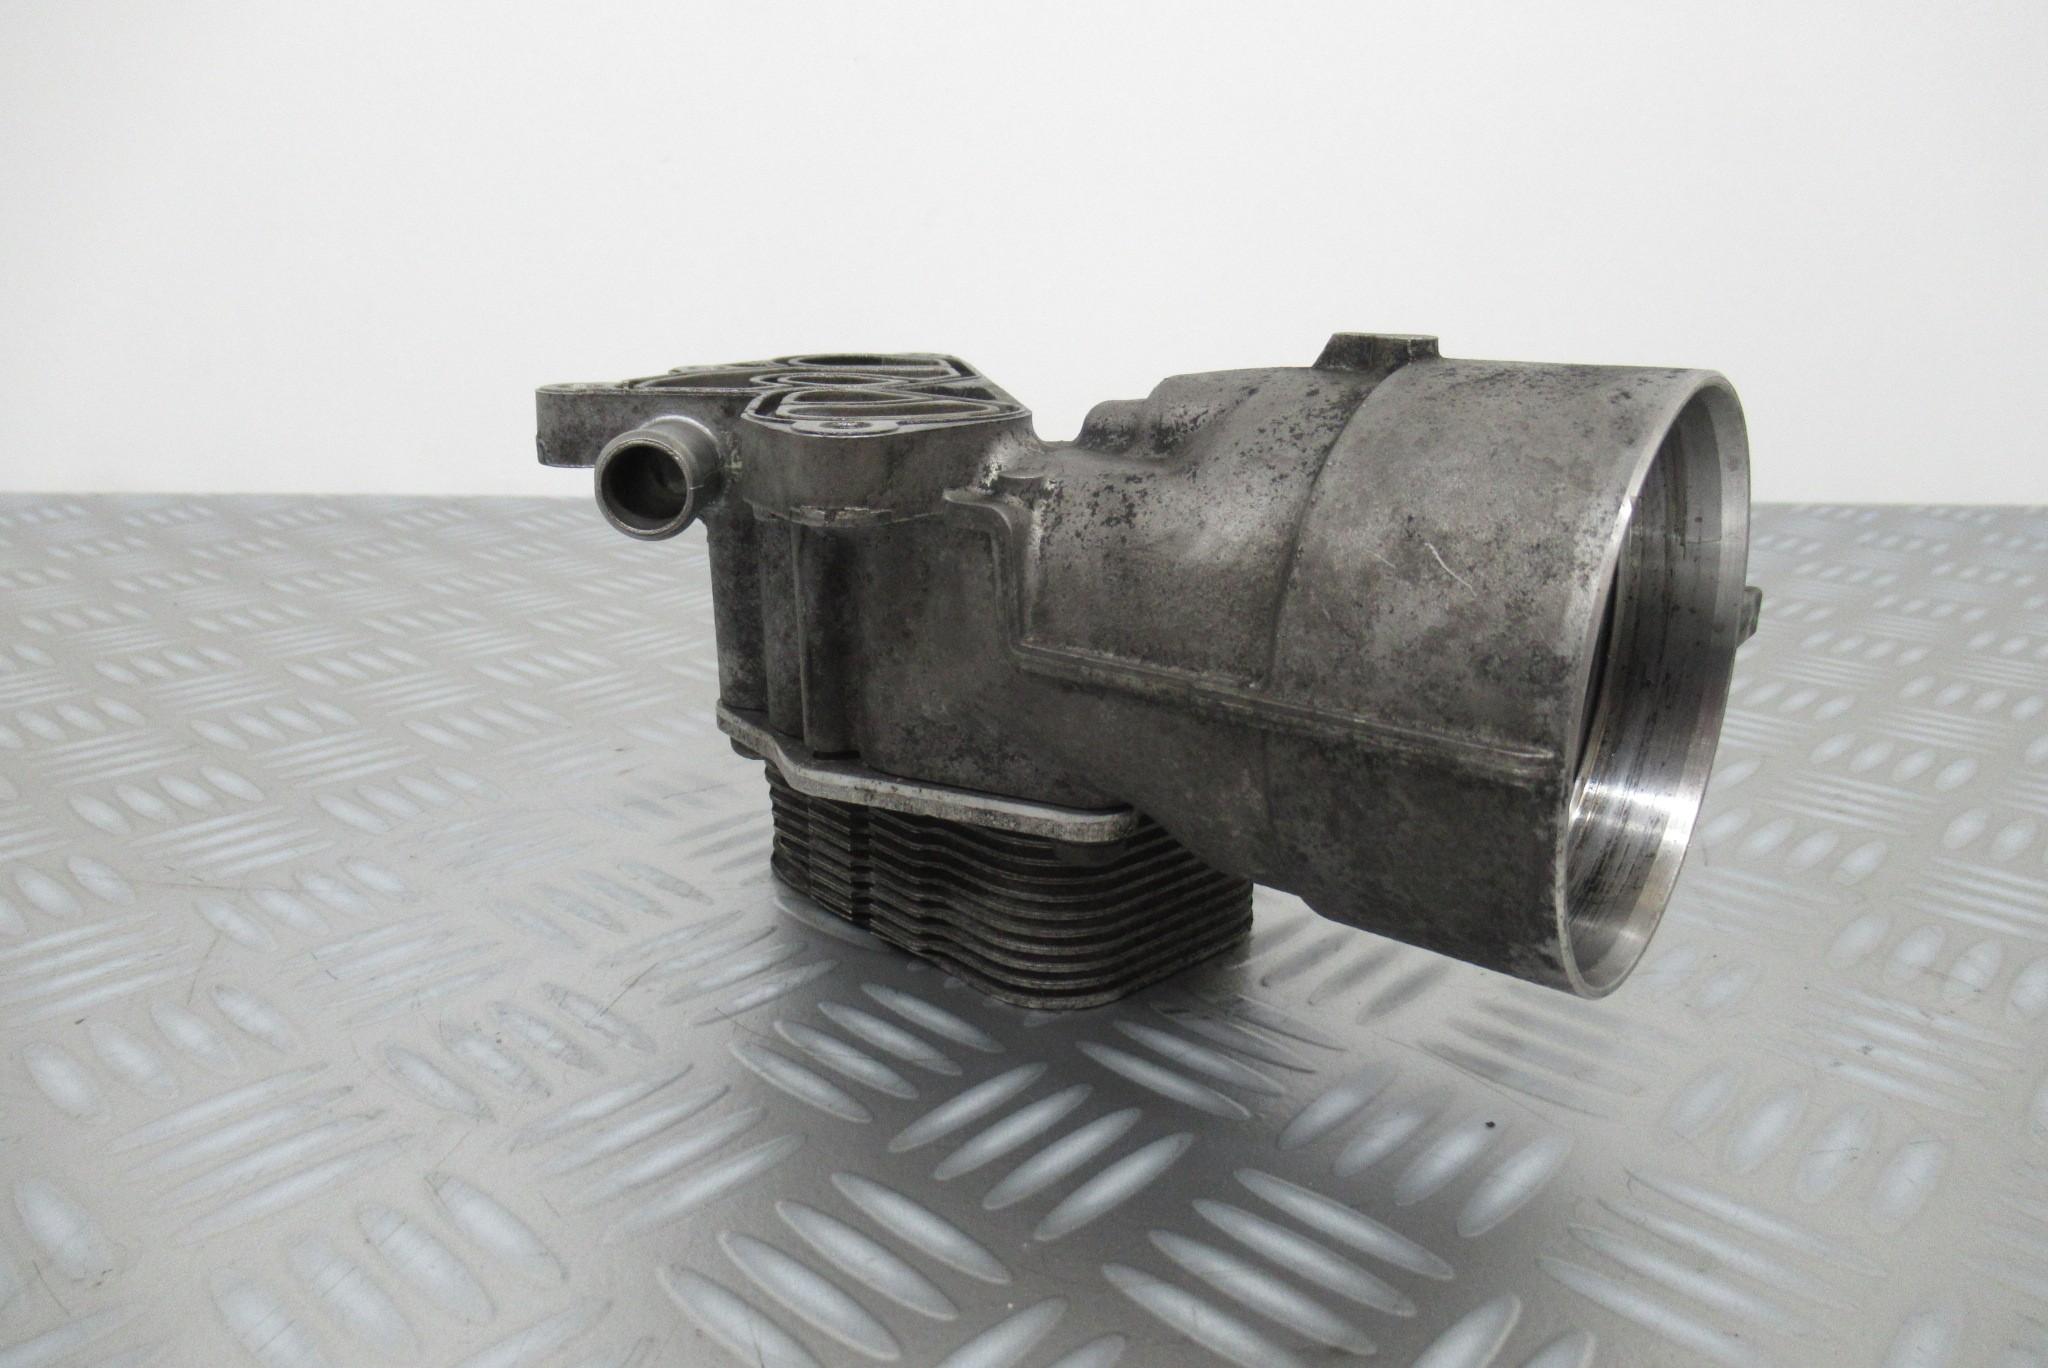 Support filtre a huile Citoen C3 1,6 HDI  9656969980